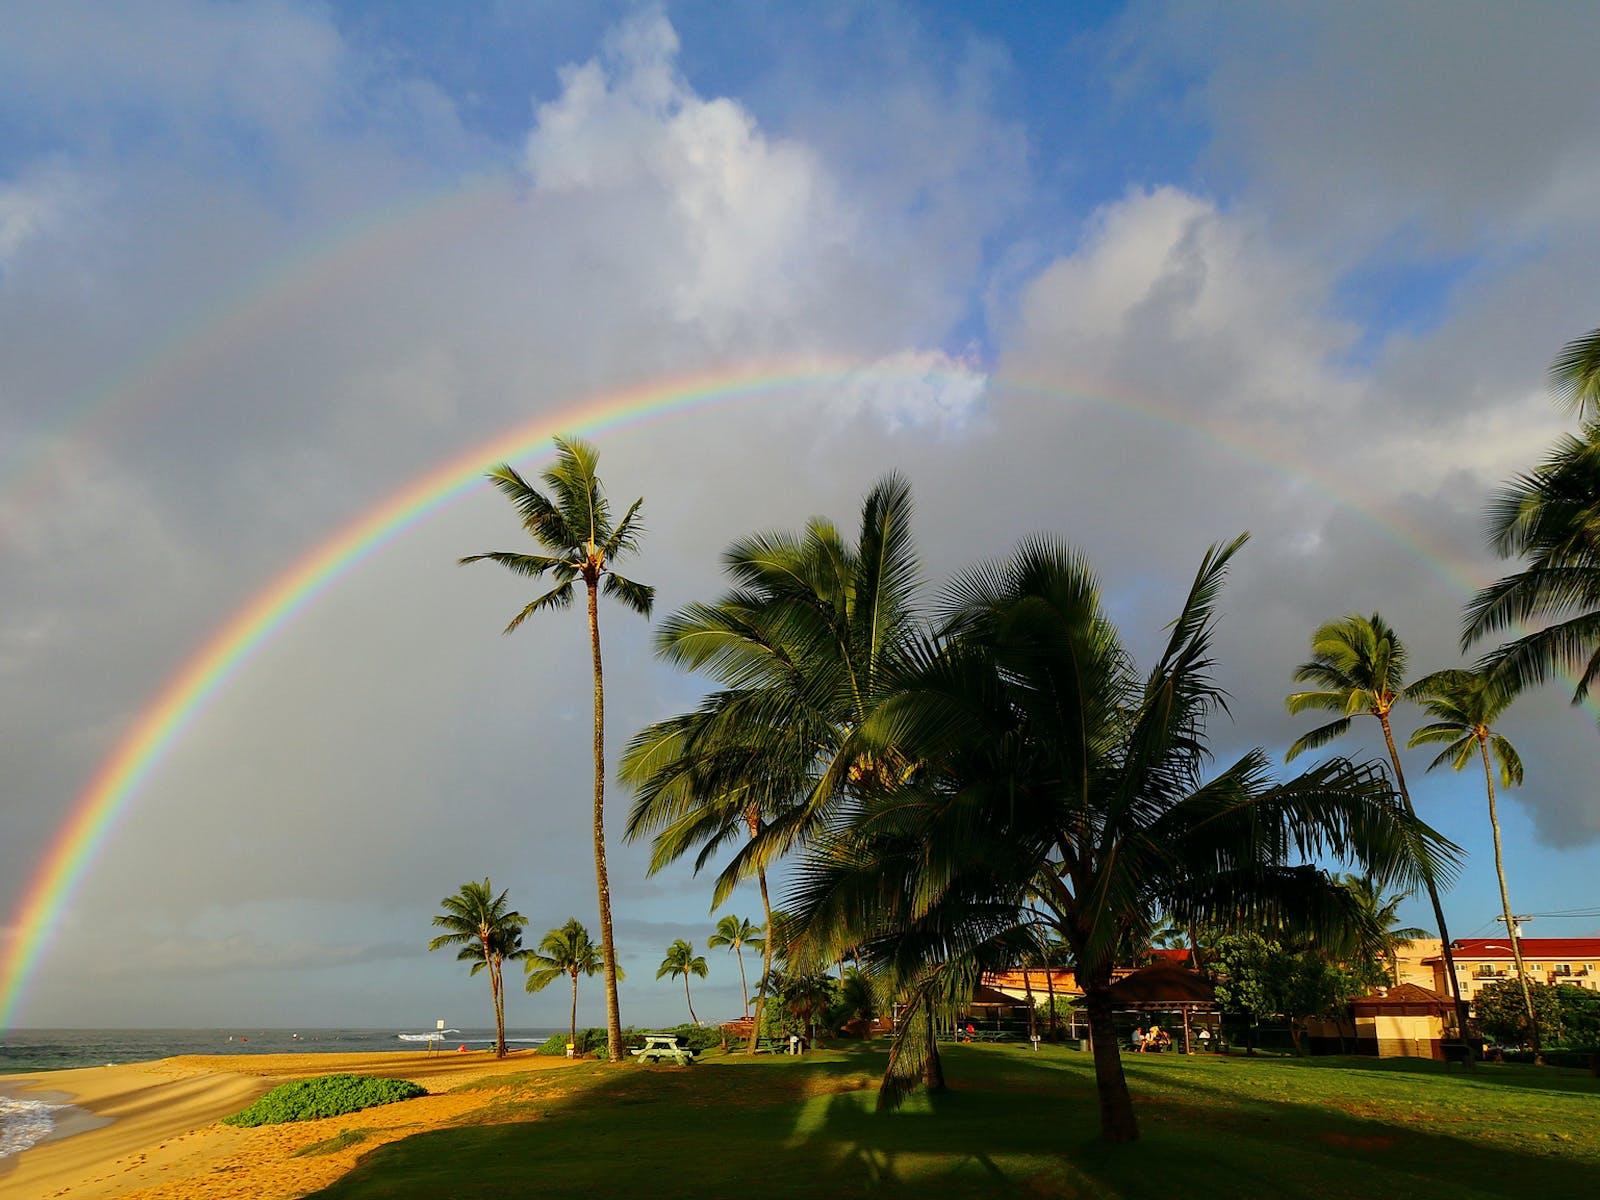 a rainbow shining above the beach and palm trees in Kauai